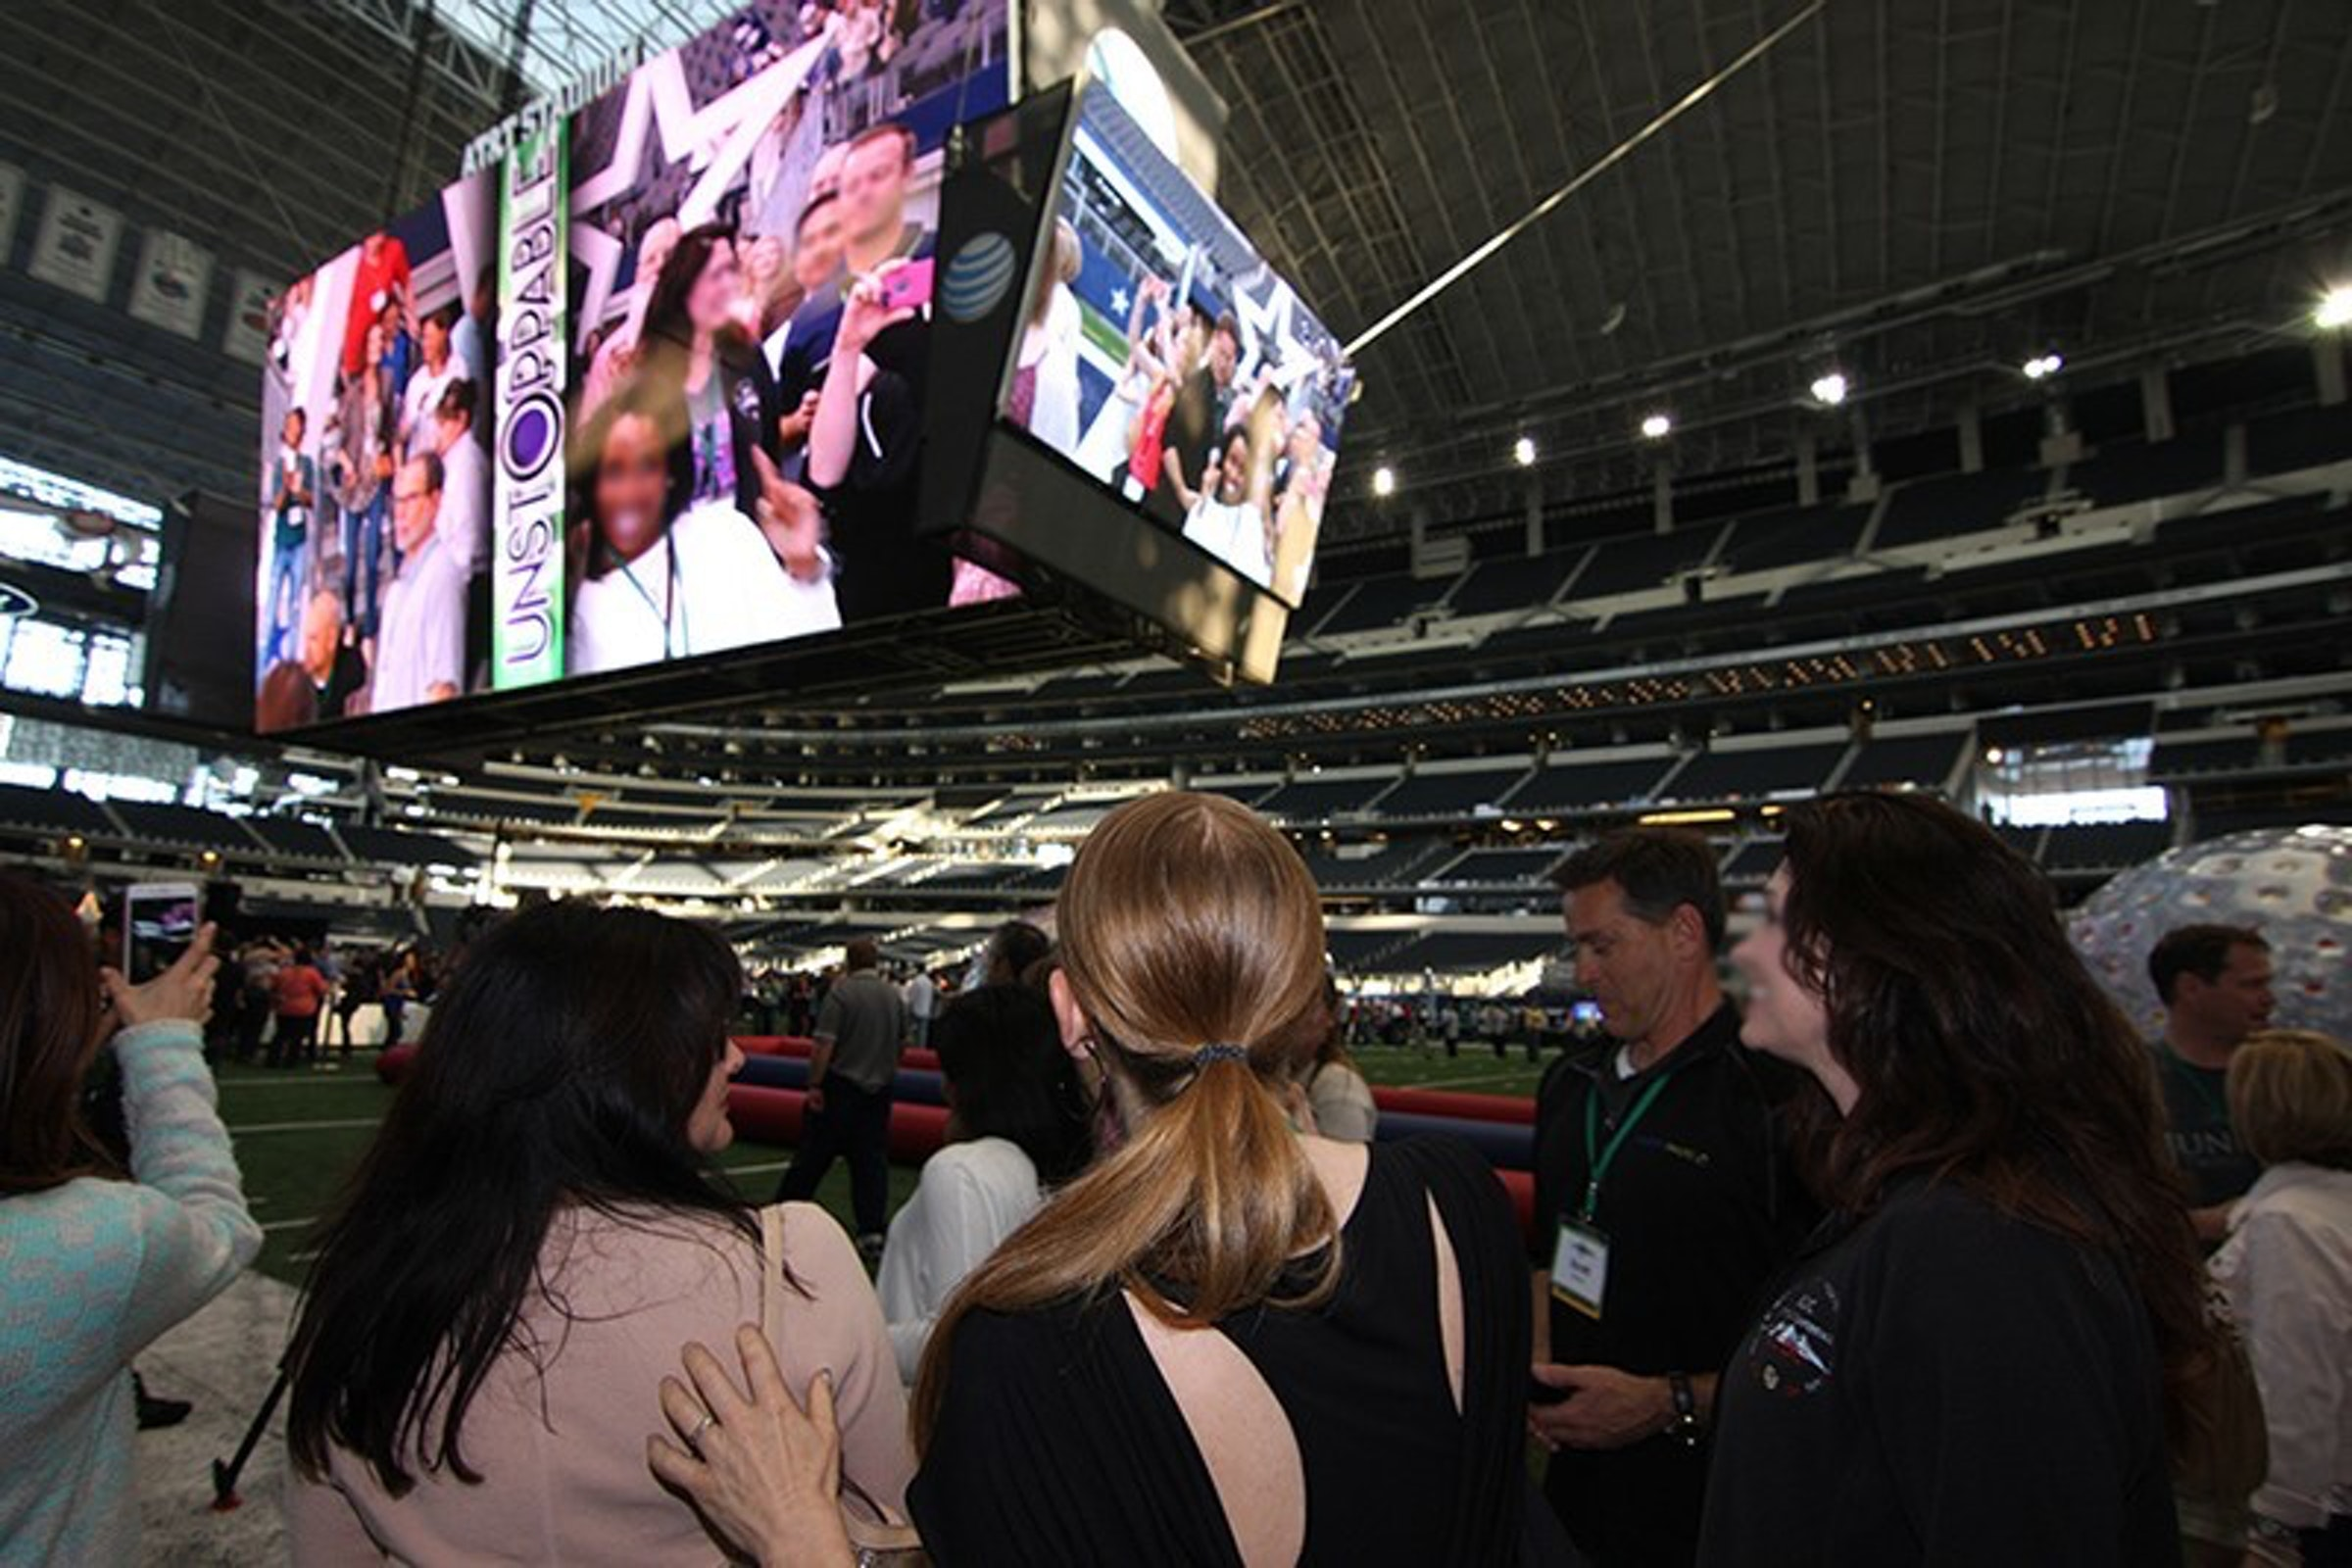 ACCESS Texas in Beyond Dallas